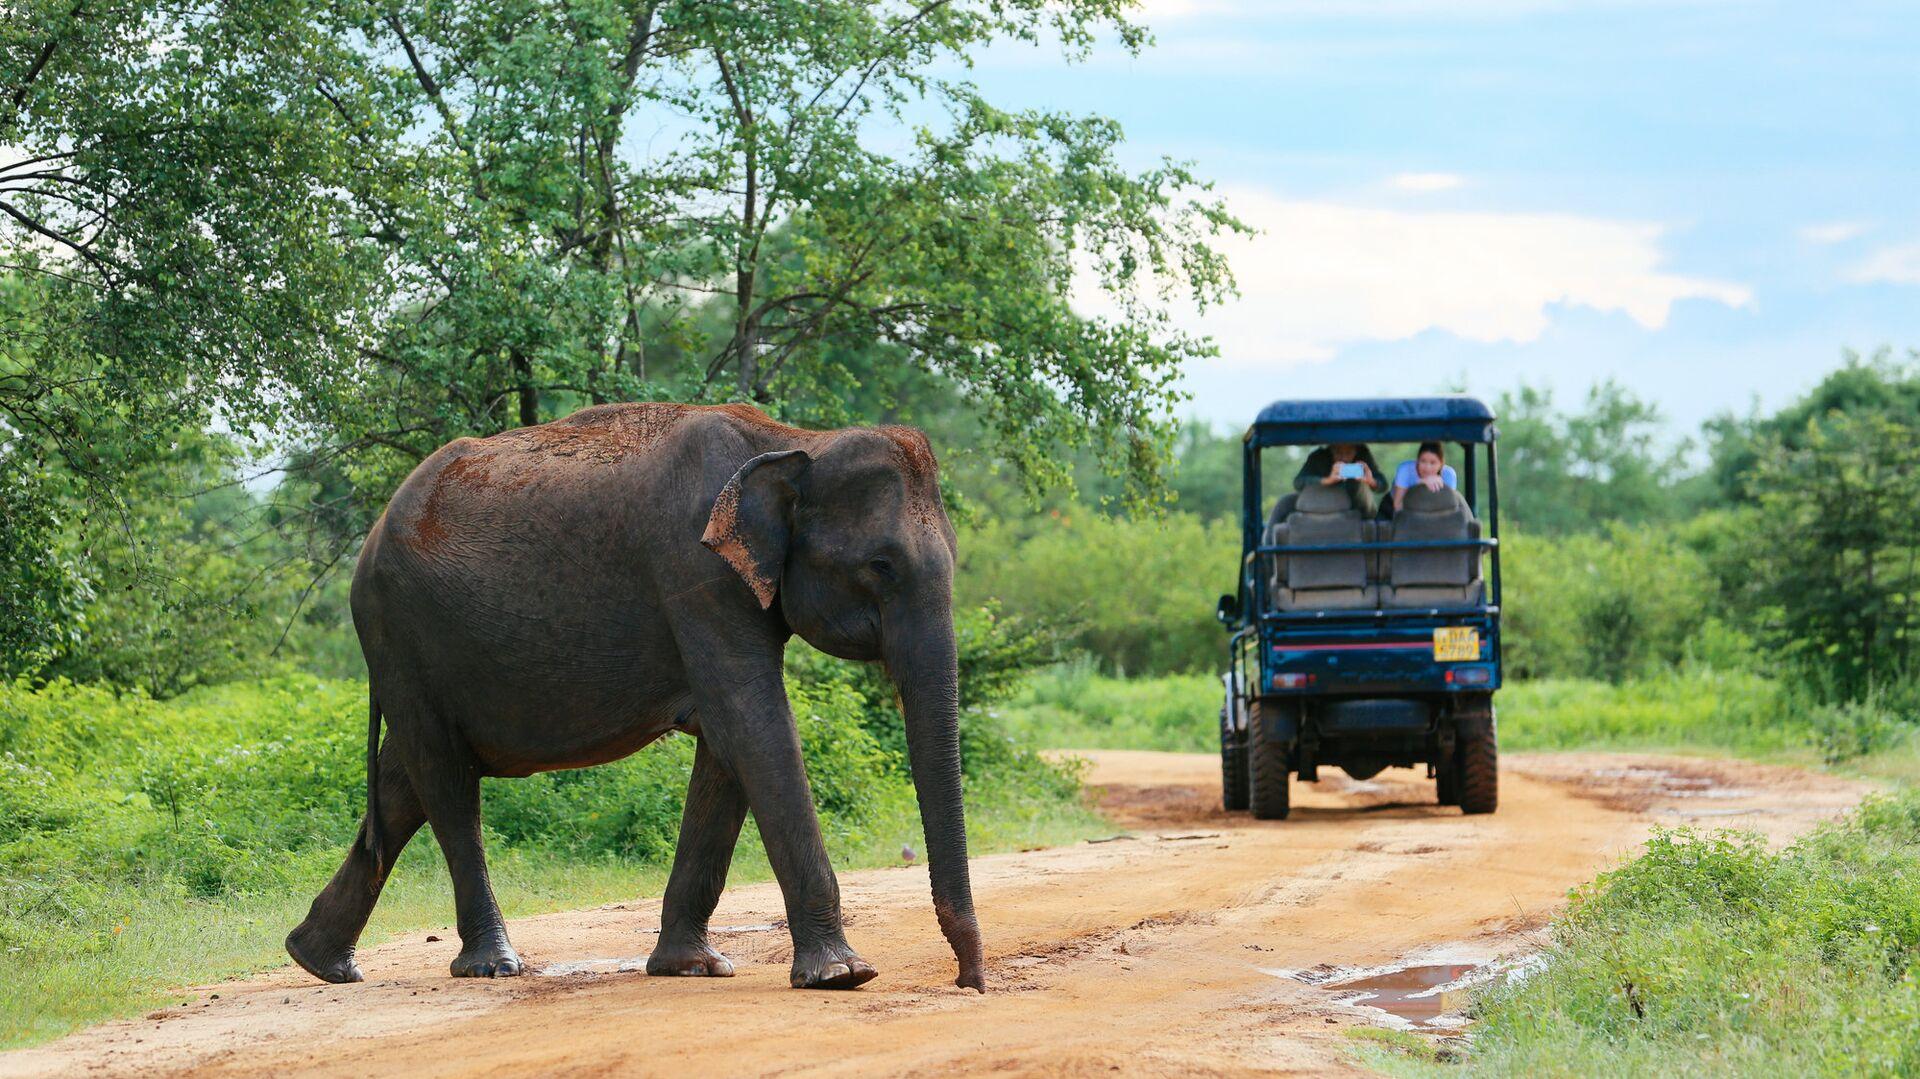 Слон на дороге в Шри-Ланке - РИА Новости, 1920, 13.05.2021